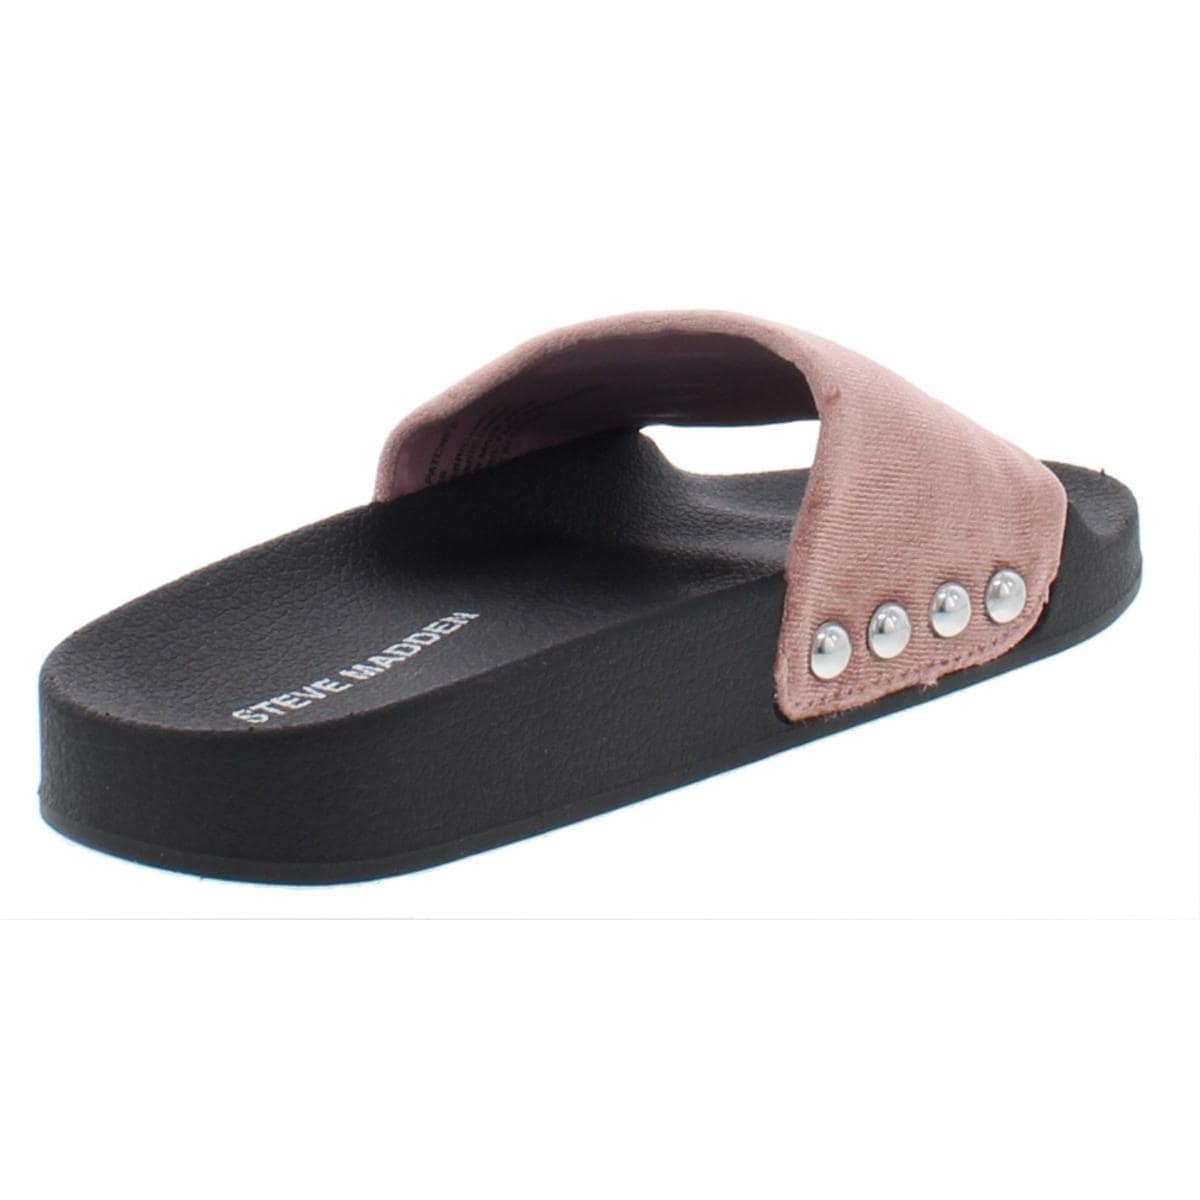 231ae6ffbda Steve Madden Womens Patches Slide Sandals